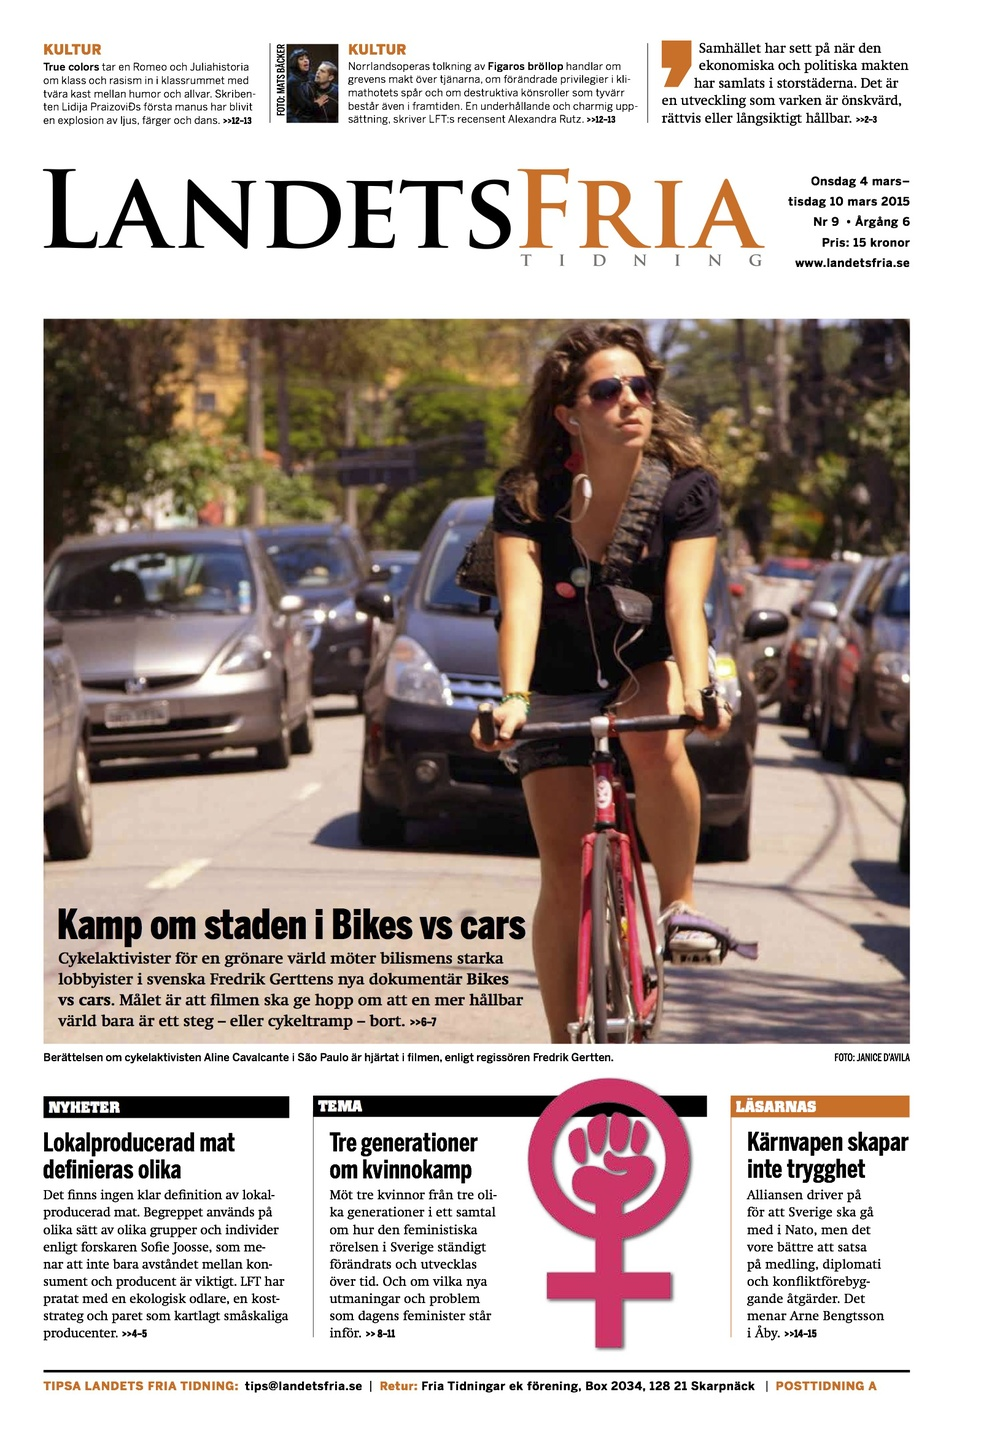 Landets Fria Tidningen - intervju med Fredrik Gertten (omslag).jpg